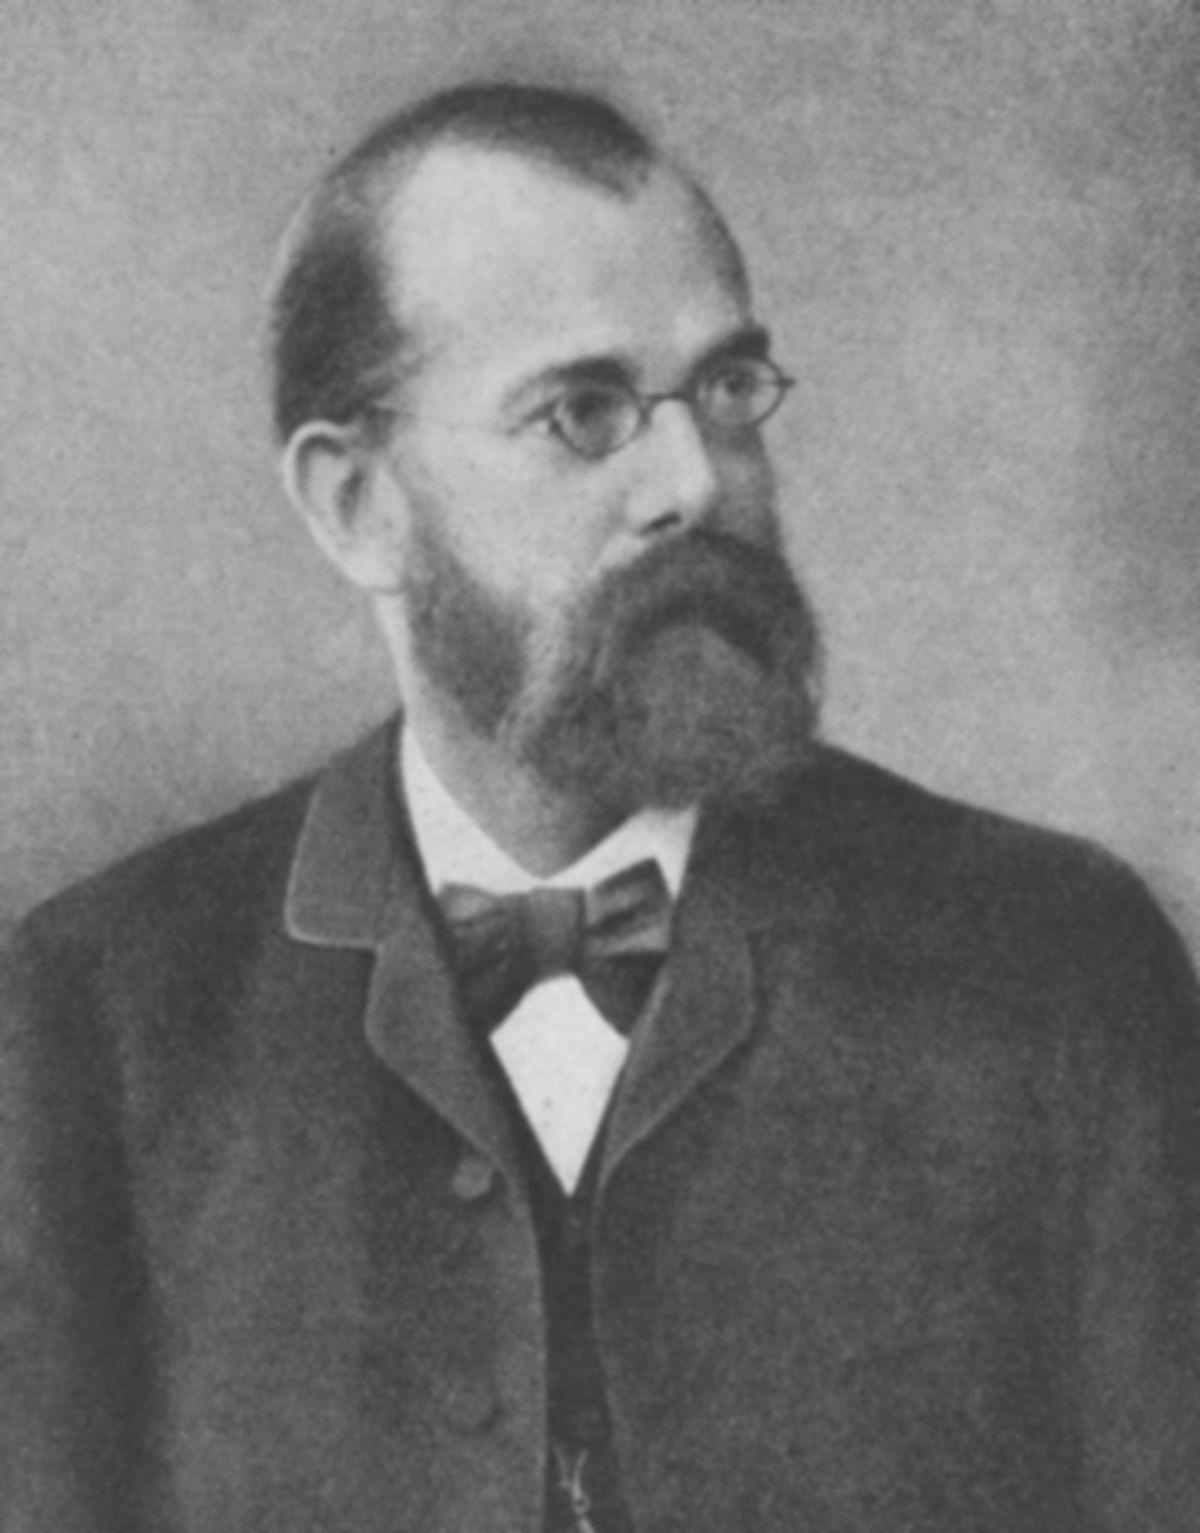 Robert koch simple english wikipedia the free encyclopedia for Koch wikipedia